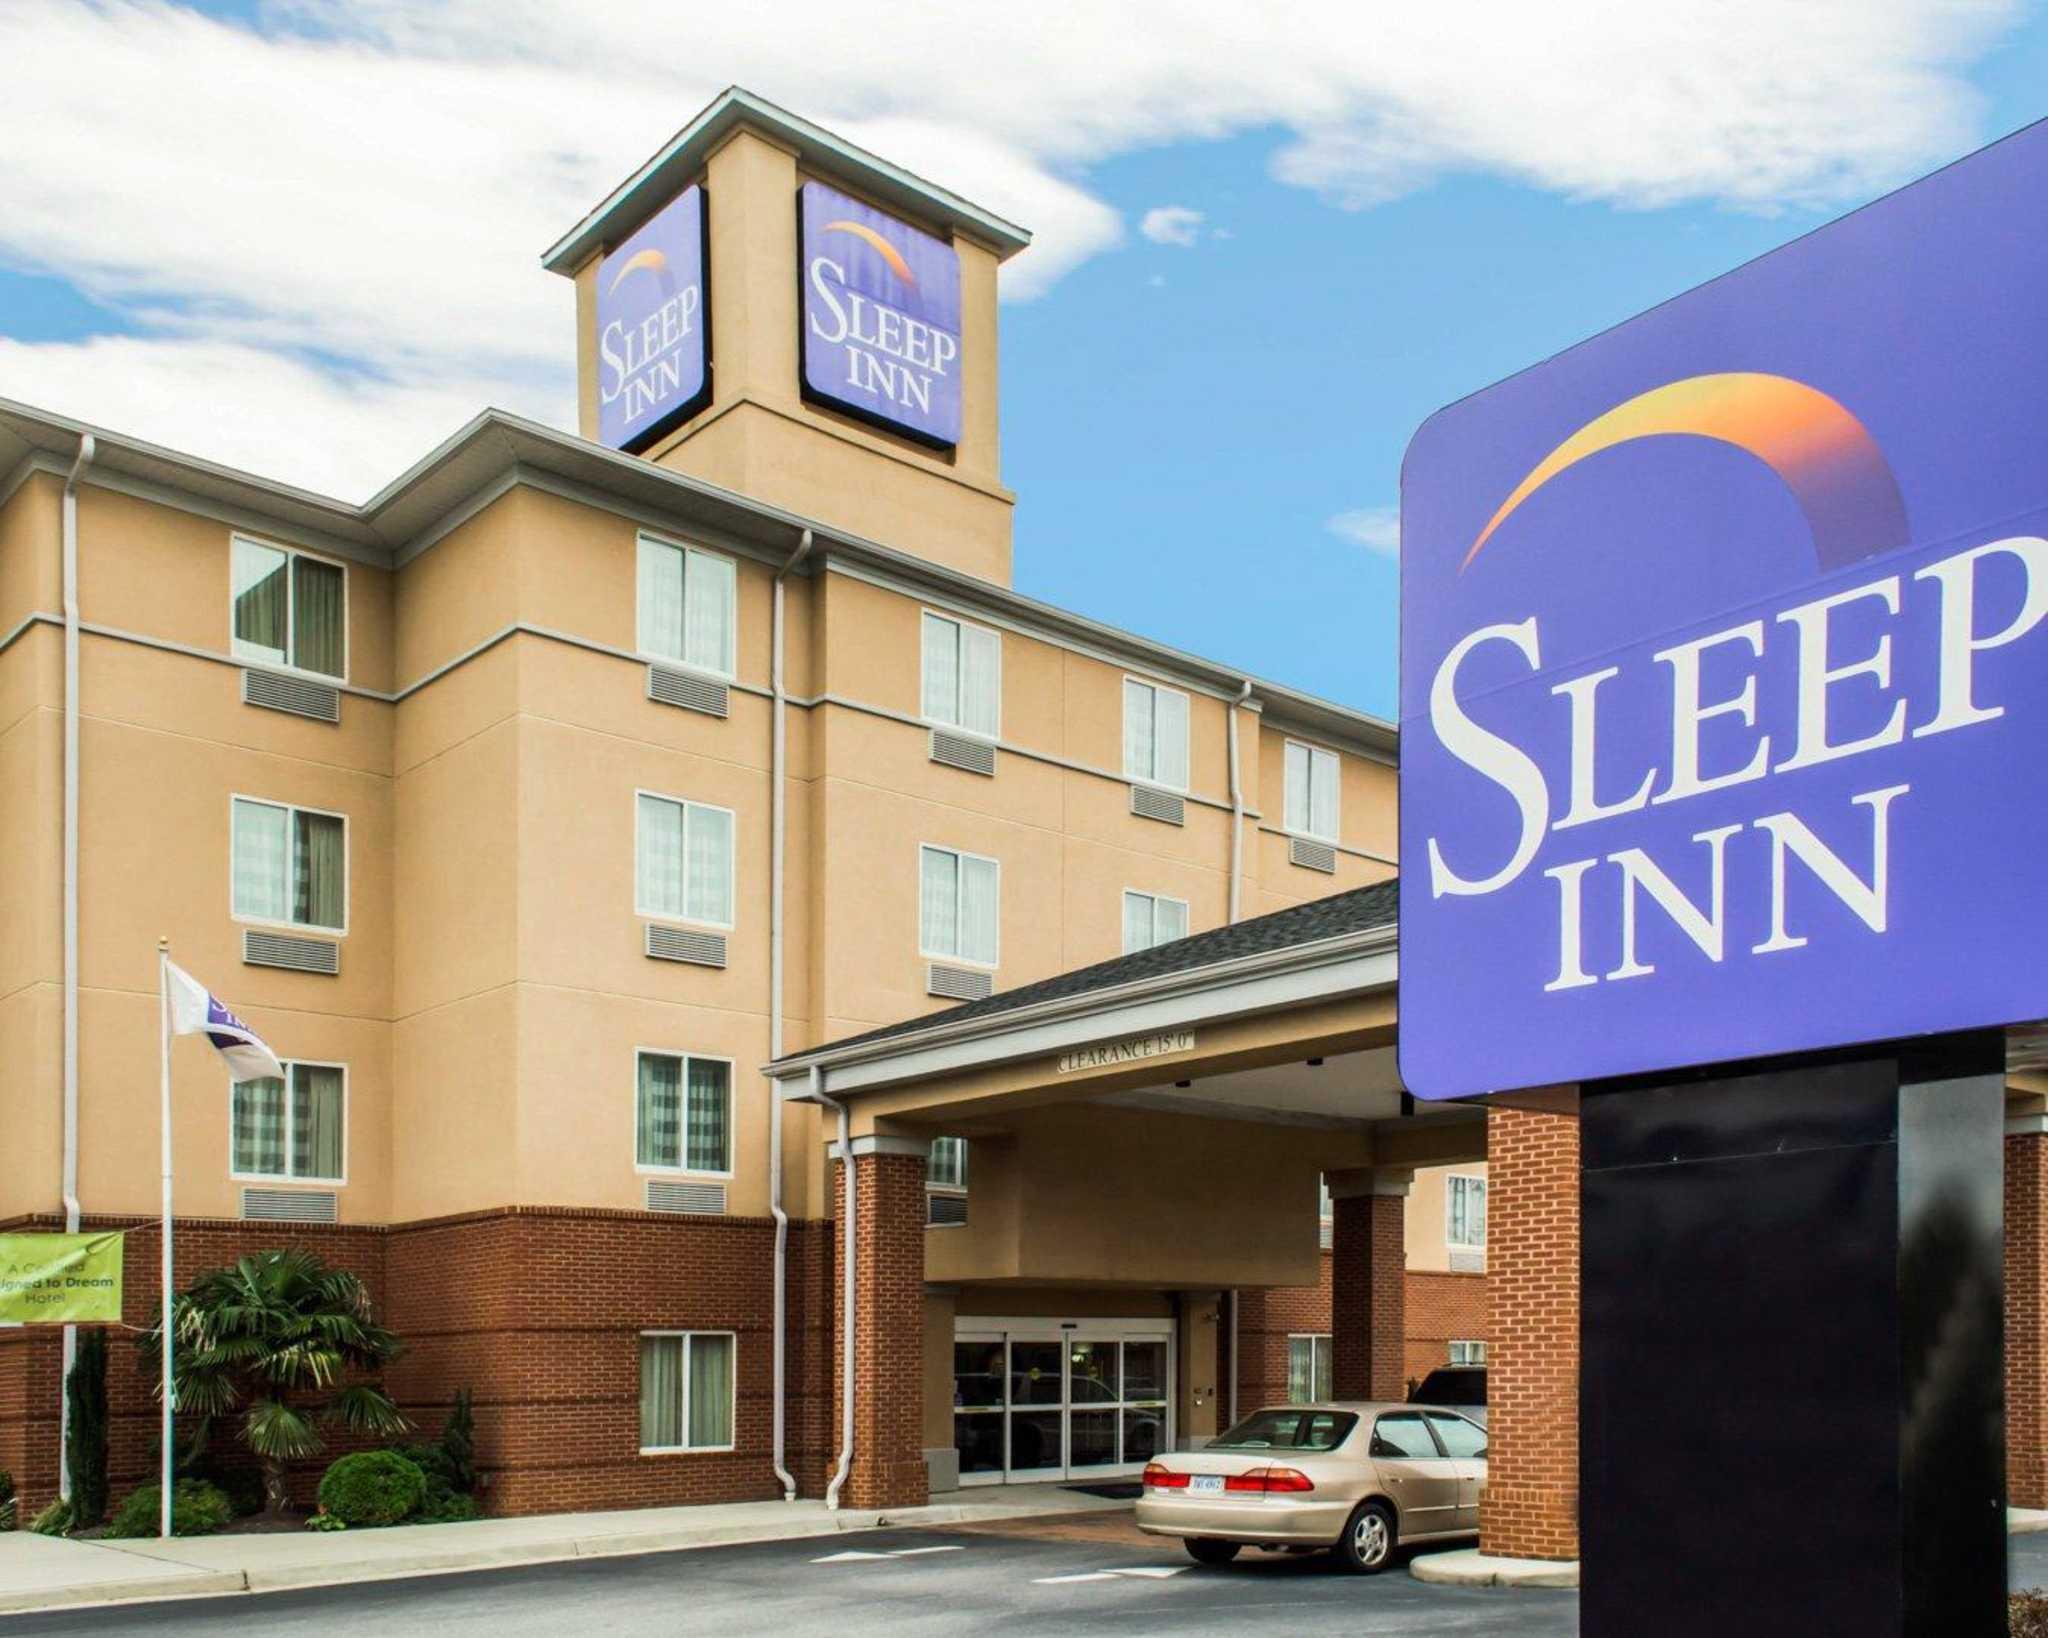 Sleep Inn Emporia Emporia UnitedStates